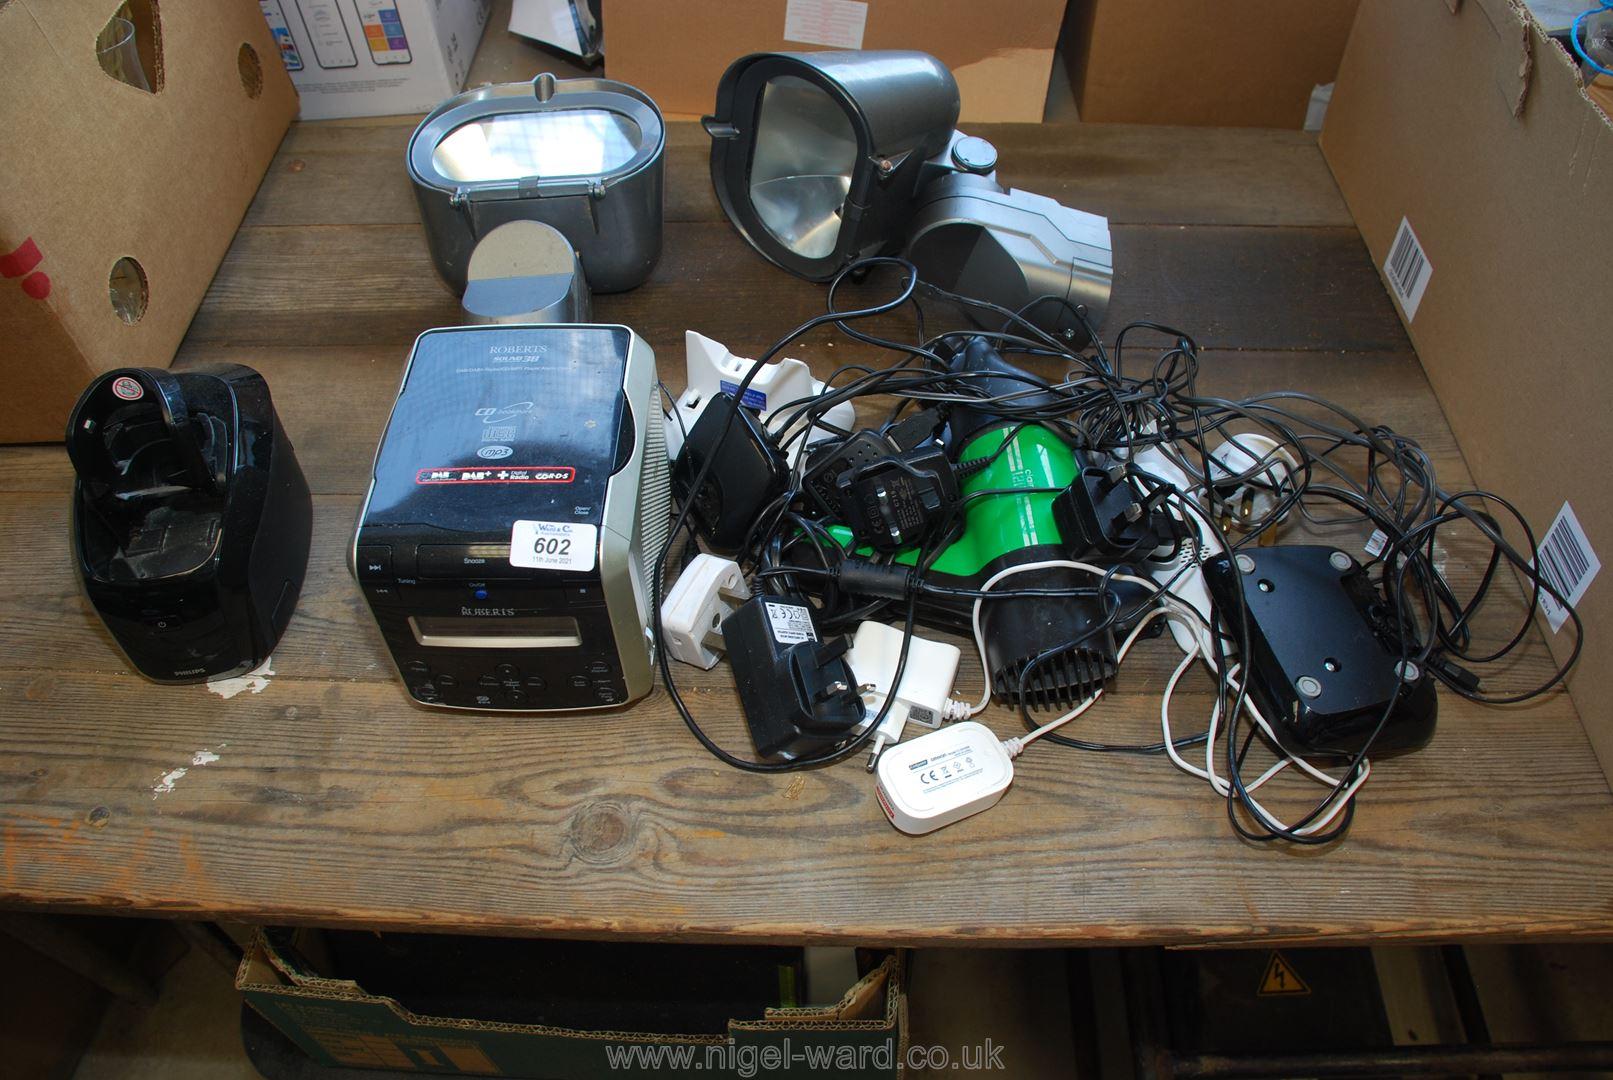 A box of two halogen lights, Roberts radio, cordless phones etc.